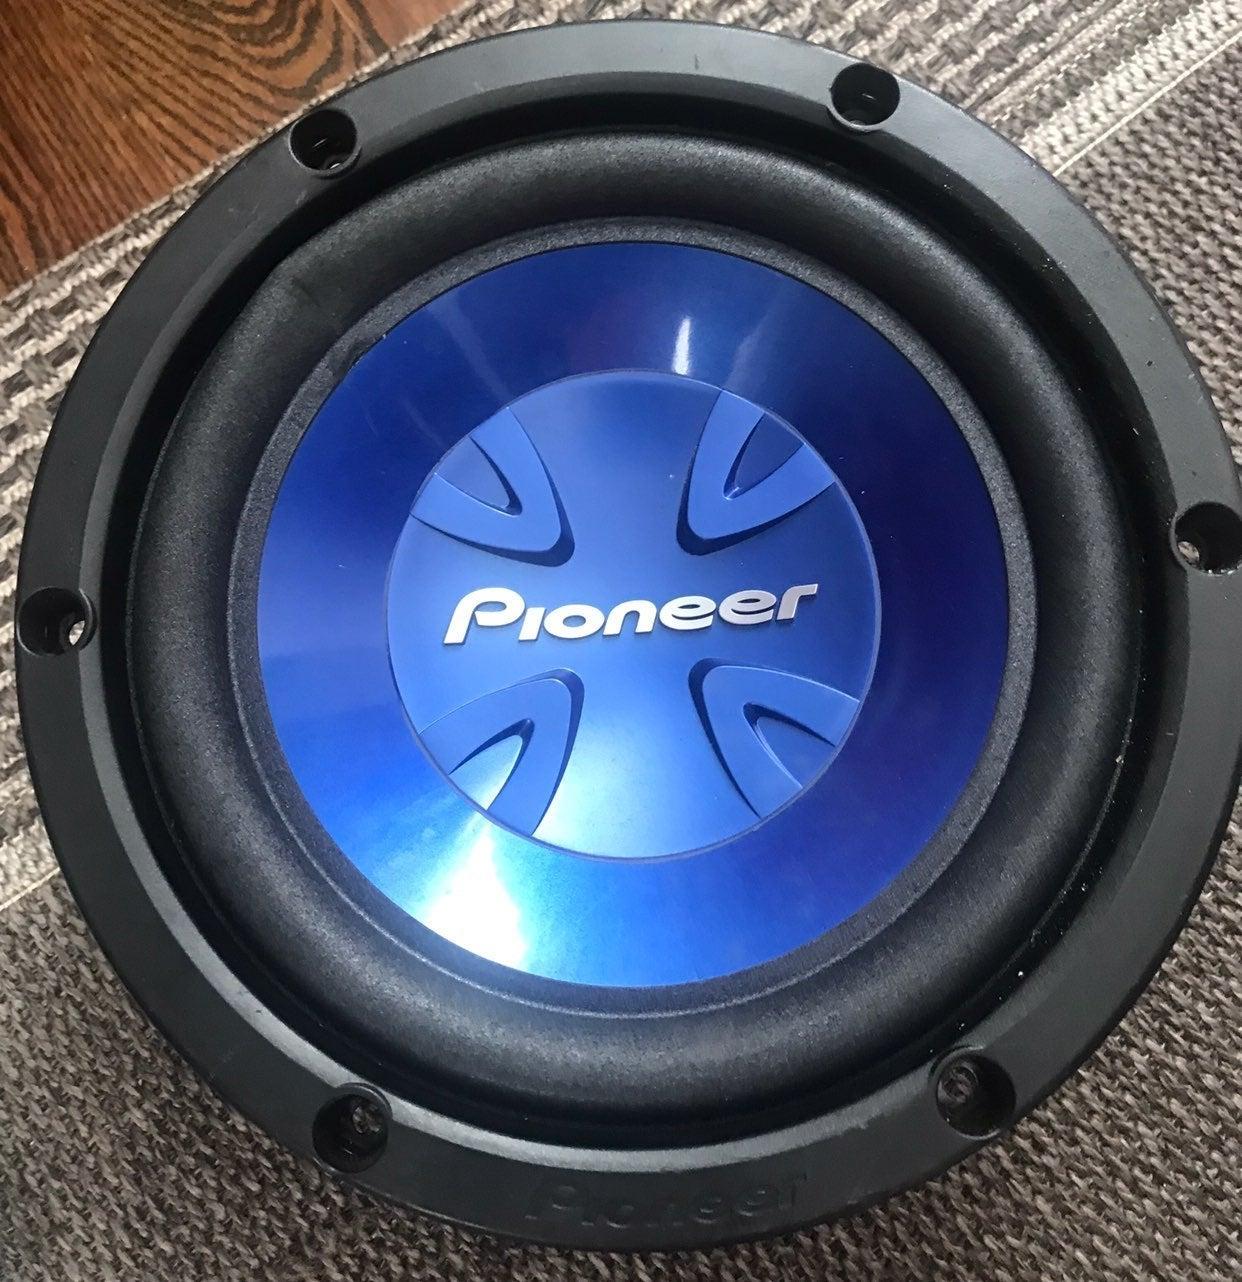 Pioneer subwoofer